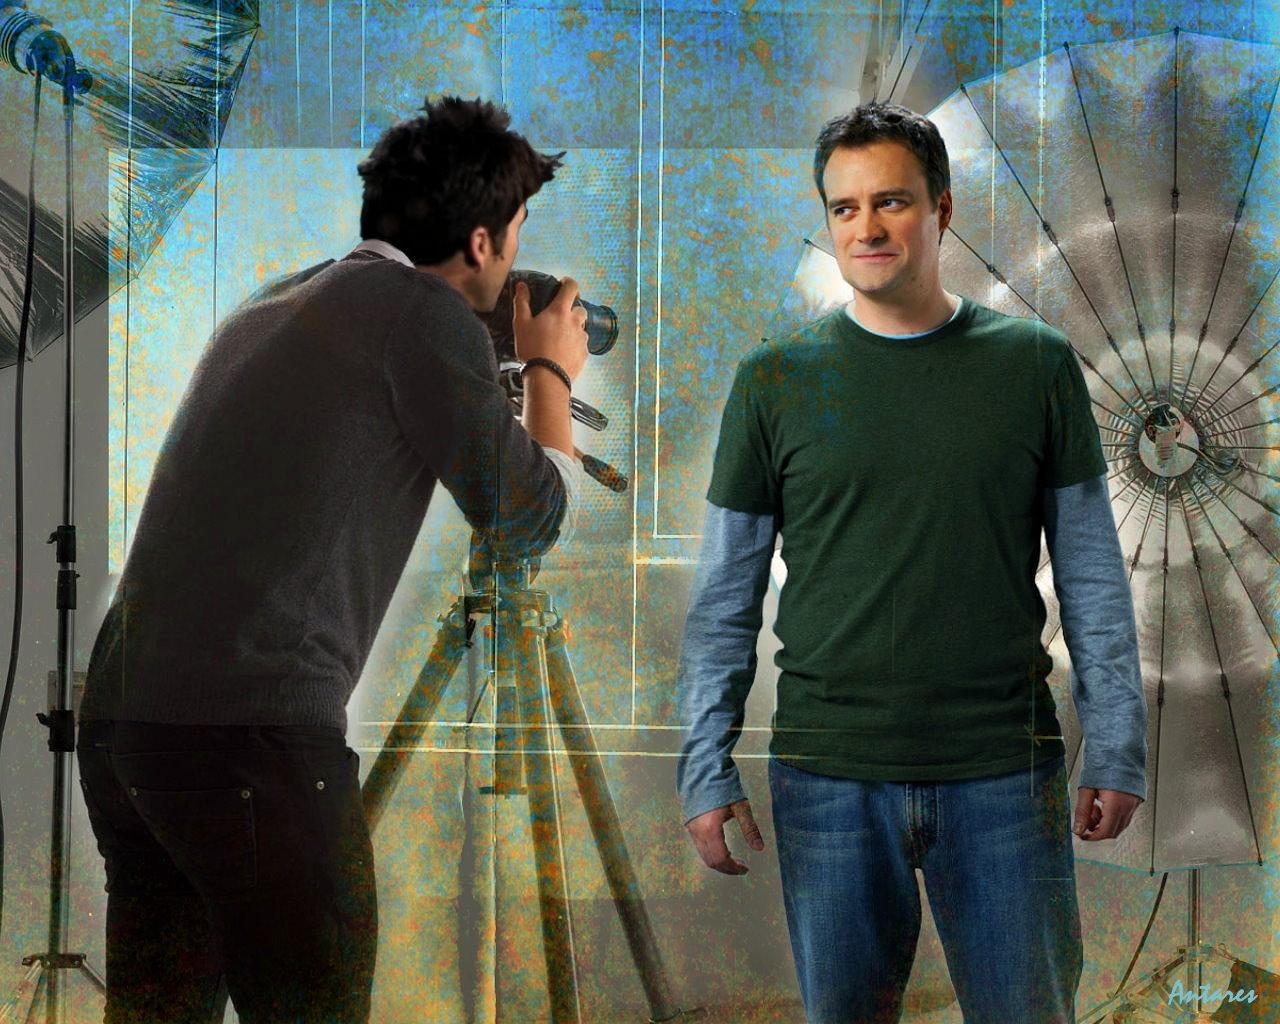 Photographer John